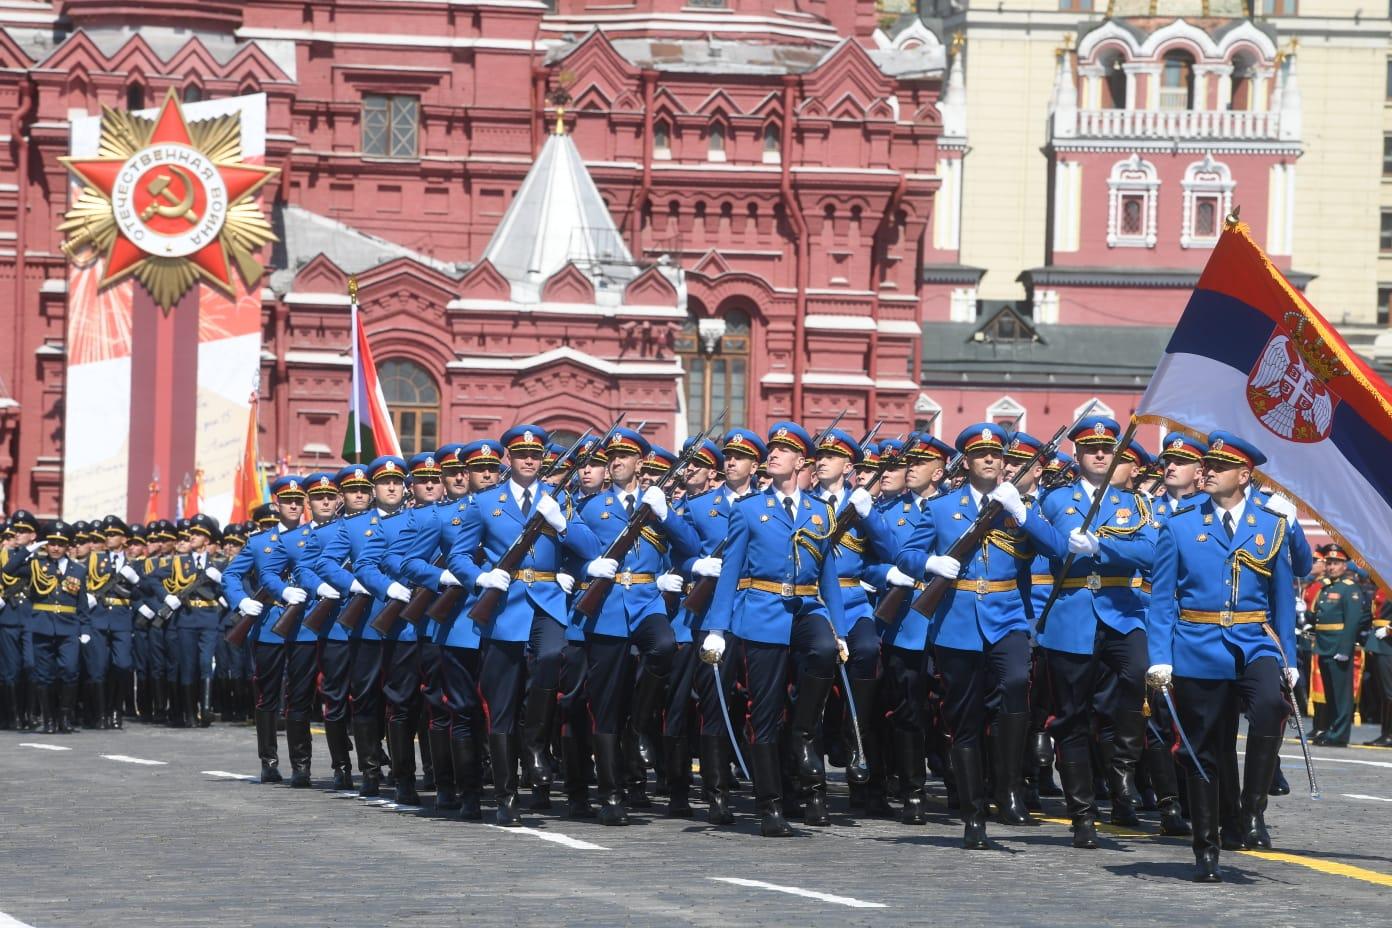 Gardisti Vojske Srbije na Paradi pobede u Moskvi povodom 75. godišnjice pobede nad fašizmom u Drugom svetskom ratu. 24. jun 2020. (Foto: Predsedništvo Srbije/Tanjug/Dimitrije Goll)